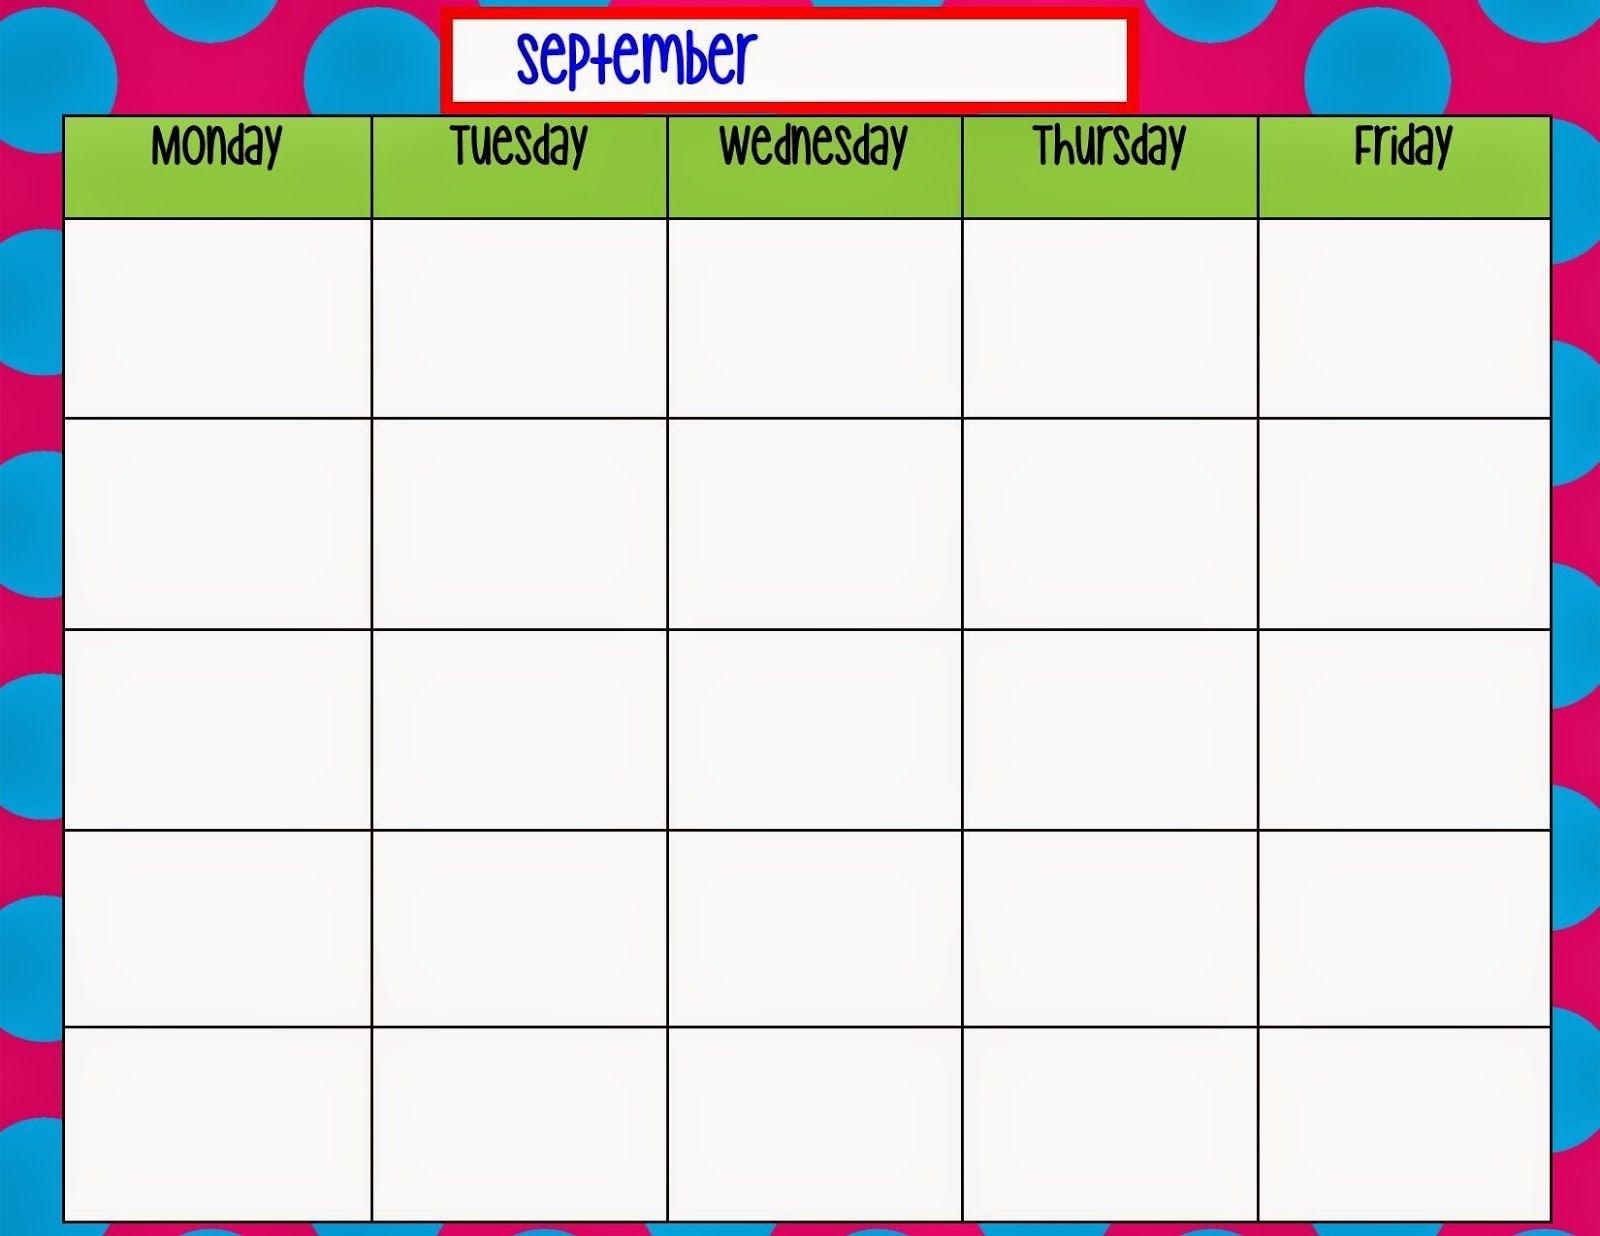 Monday Through Friday Calendar Template | Preschool | Printable inside Printable Weekly Schedule Monday Thru Friday